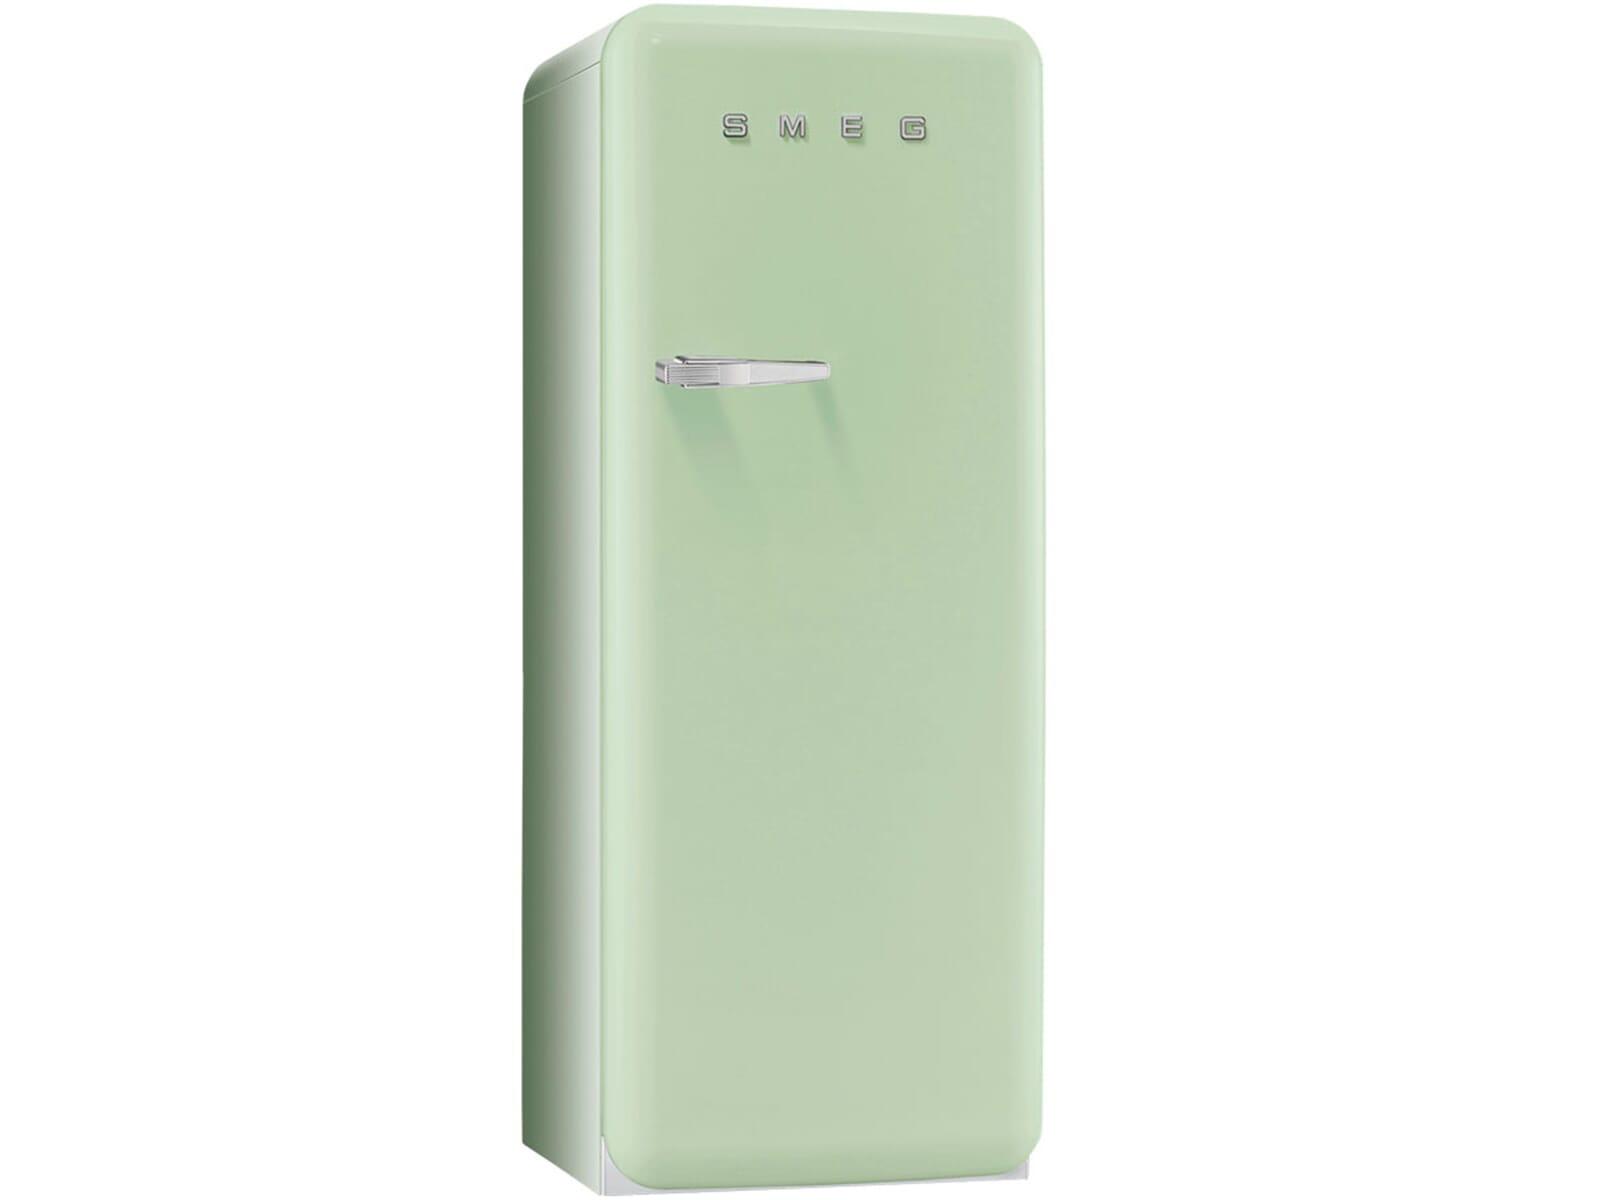 Smeg Kühlschrank Blau : Retro kühlschrank big chill pkv roo video pelgrim retro koelkast